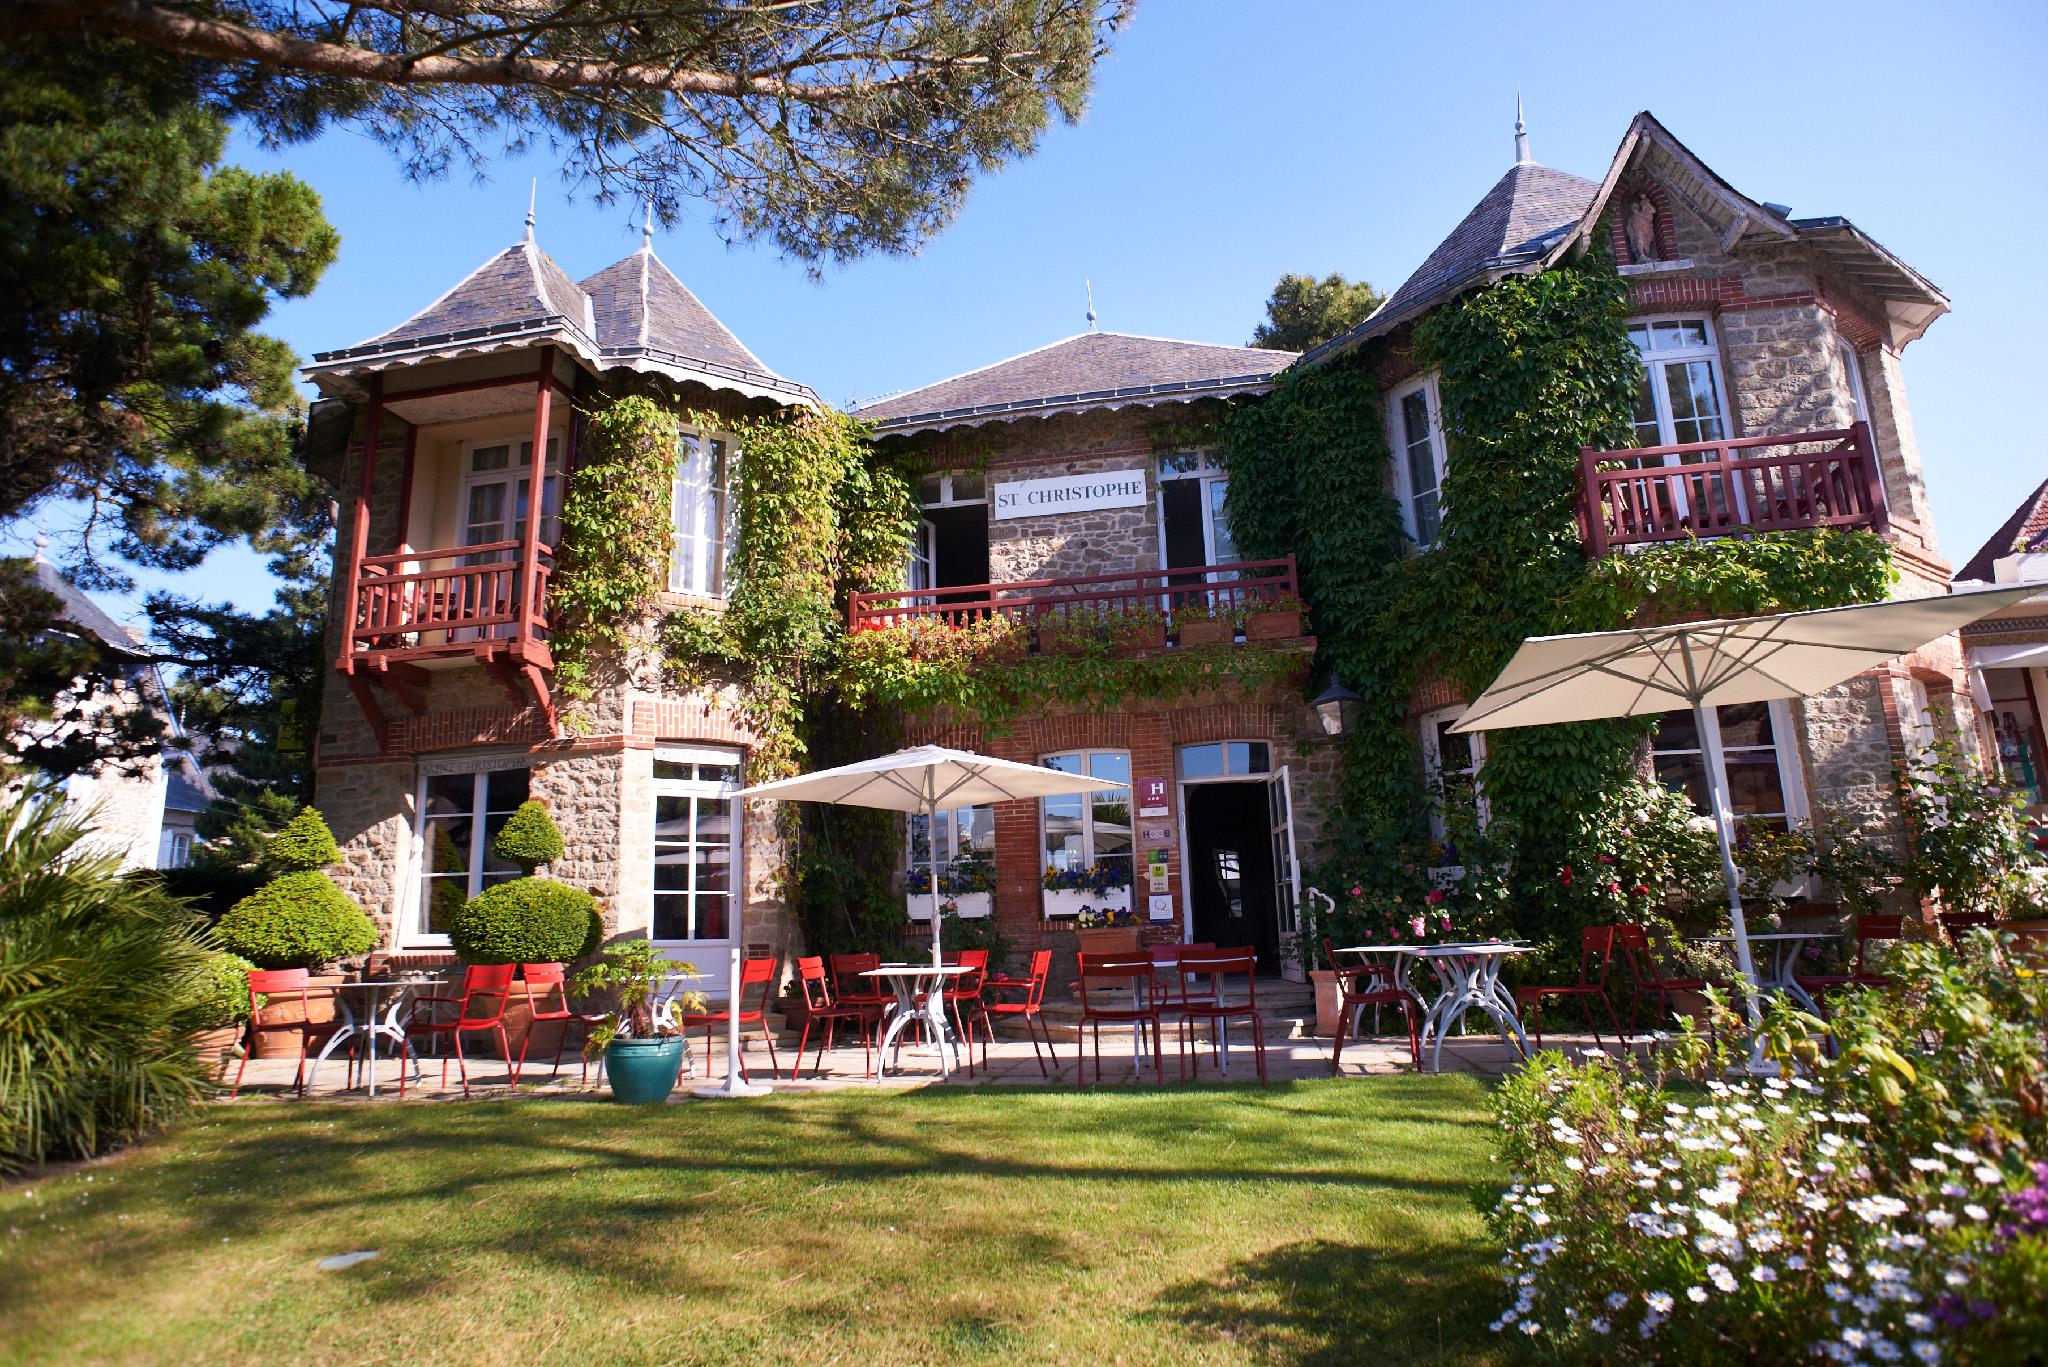 62_photographie_hotel_restaurant_nantes